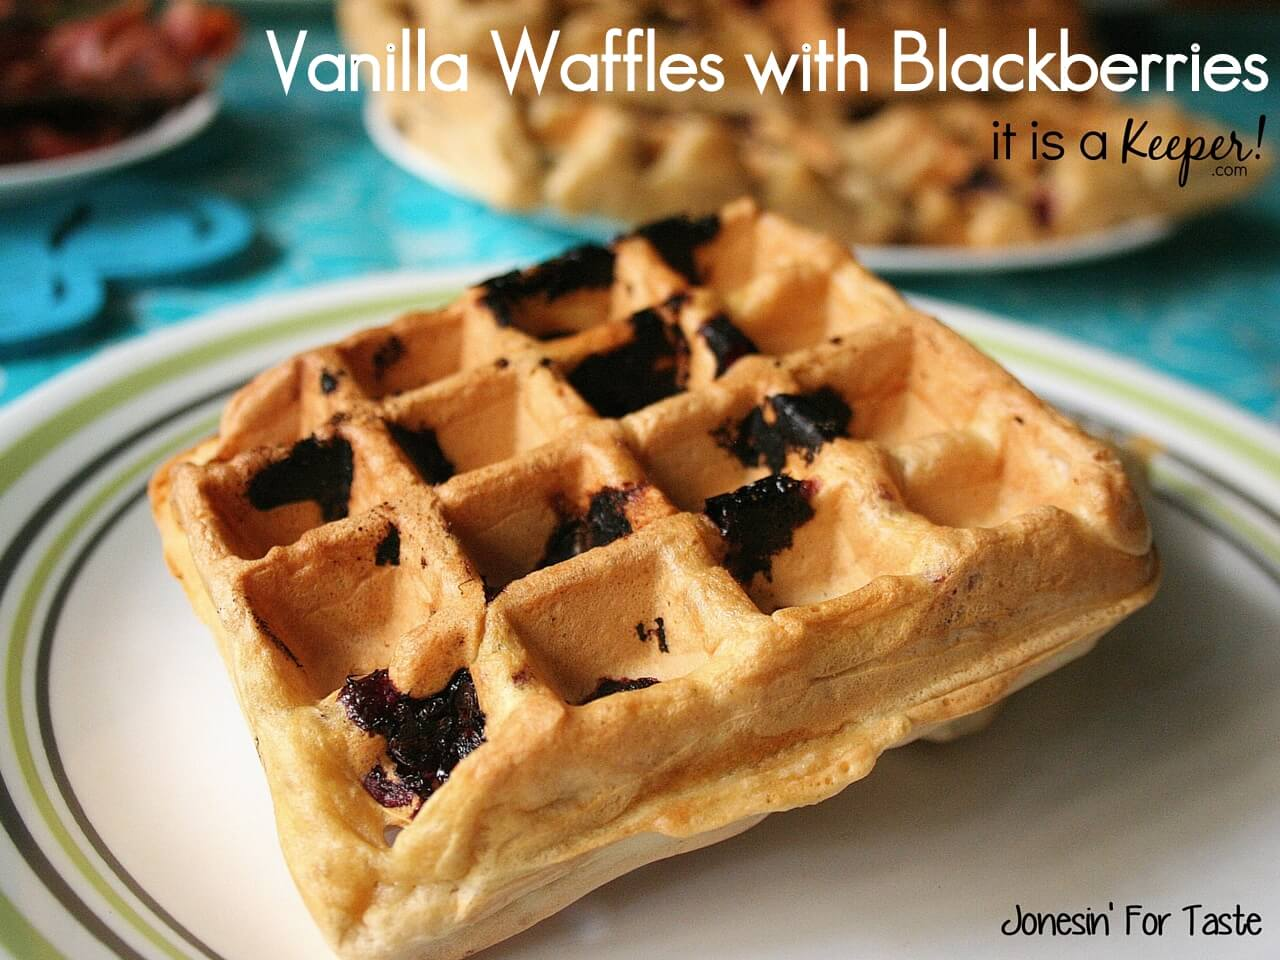 Vanilla Waffles with Blackberries make breakfast fun again and freshen up simple vanilla waffles with juicy blackberries.